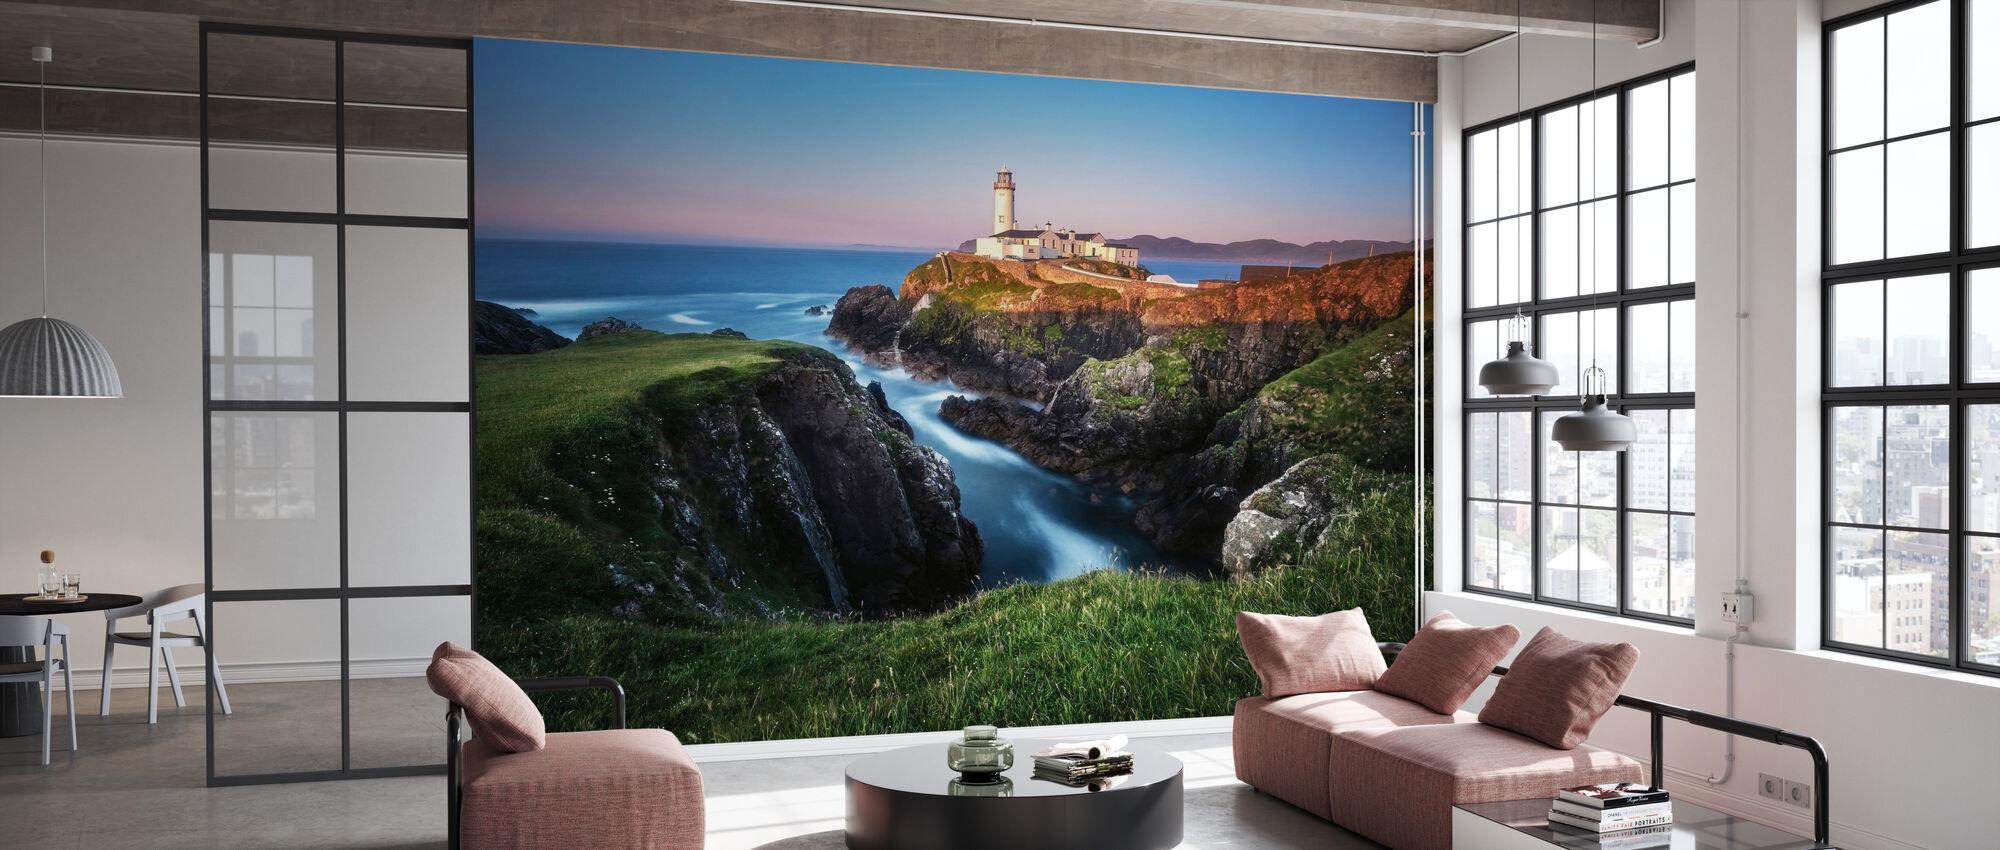 Ireland Fanad Head Lighthouse - Wallpaper - Office